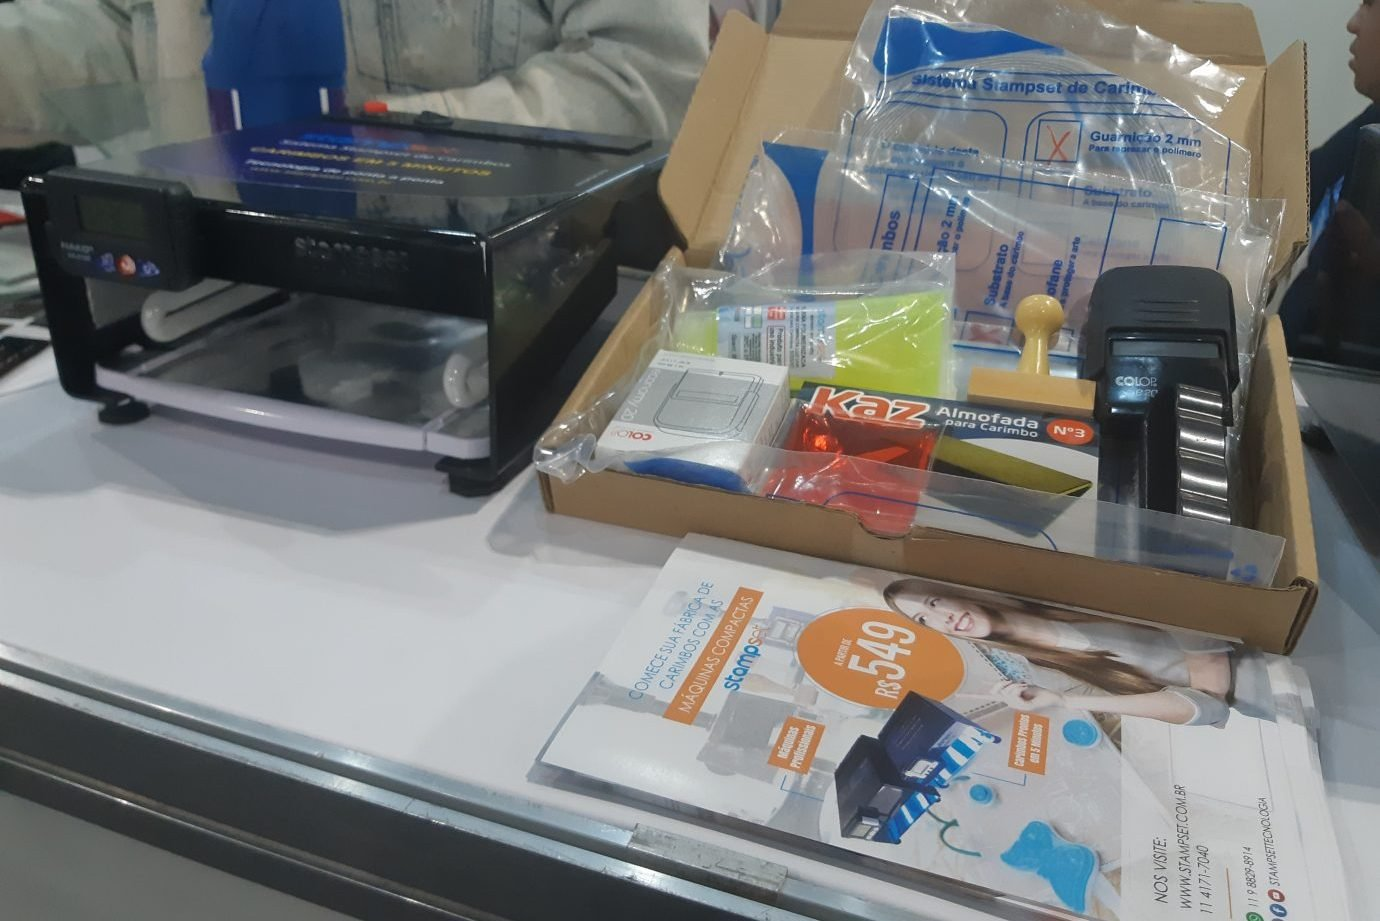 Kit da StampSet